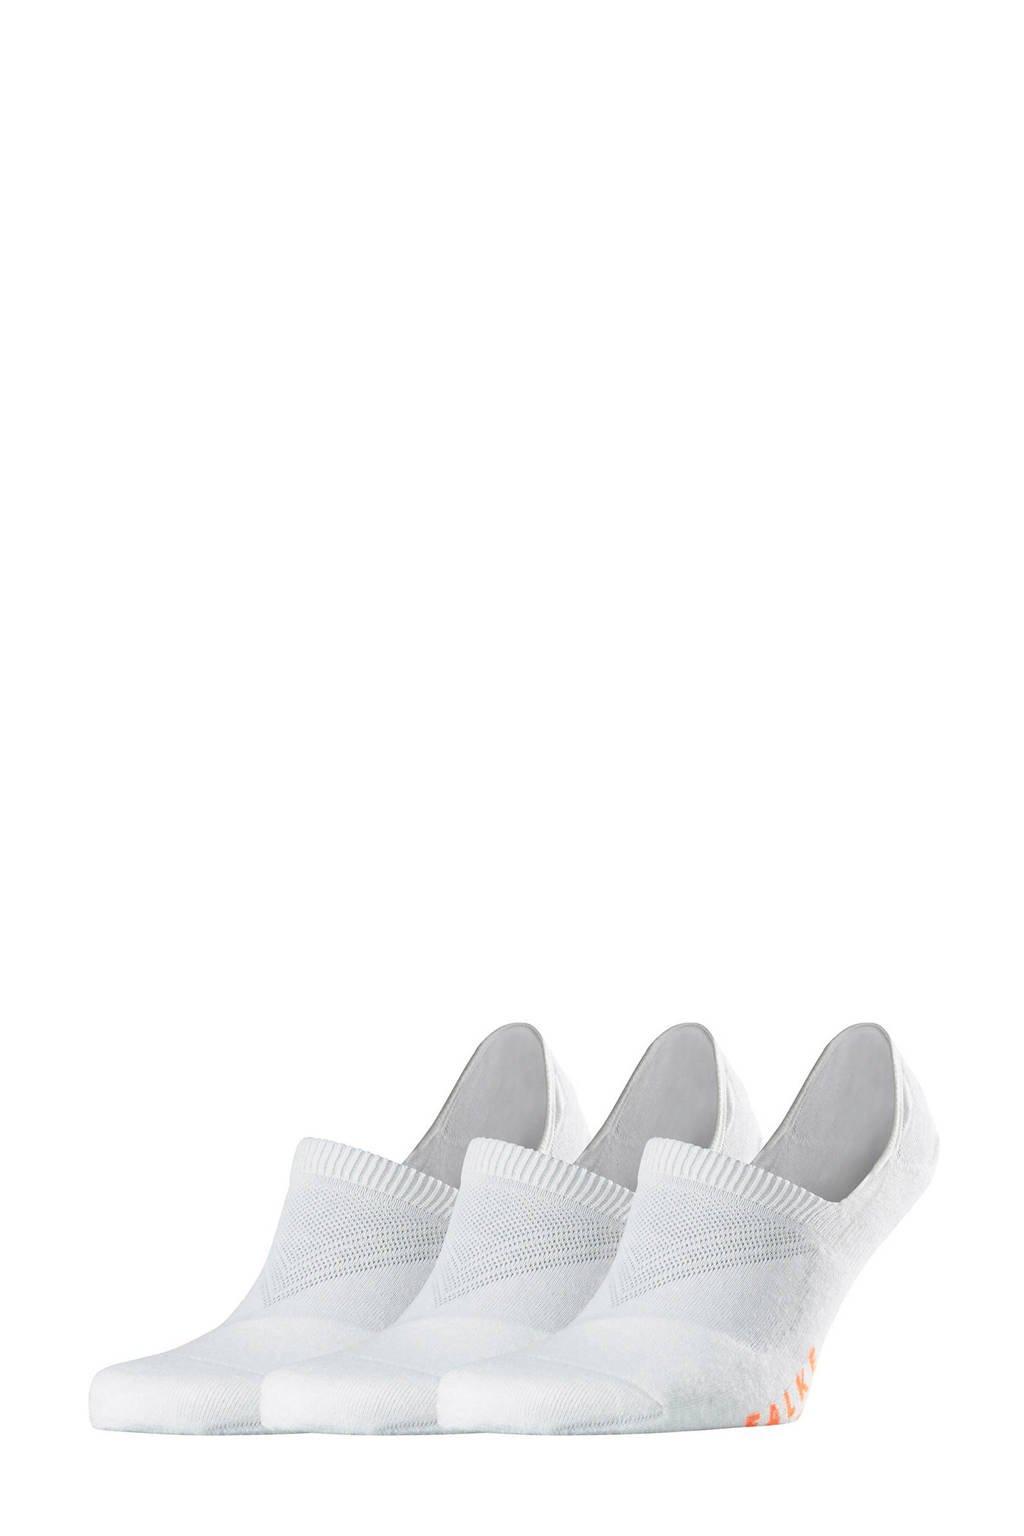 FALKE Cool Kick Invisible sneakersokken - set van 3 wit, Wit